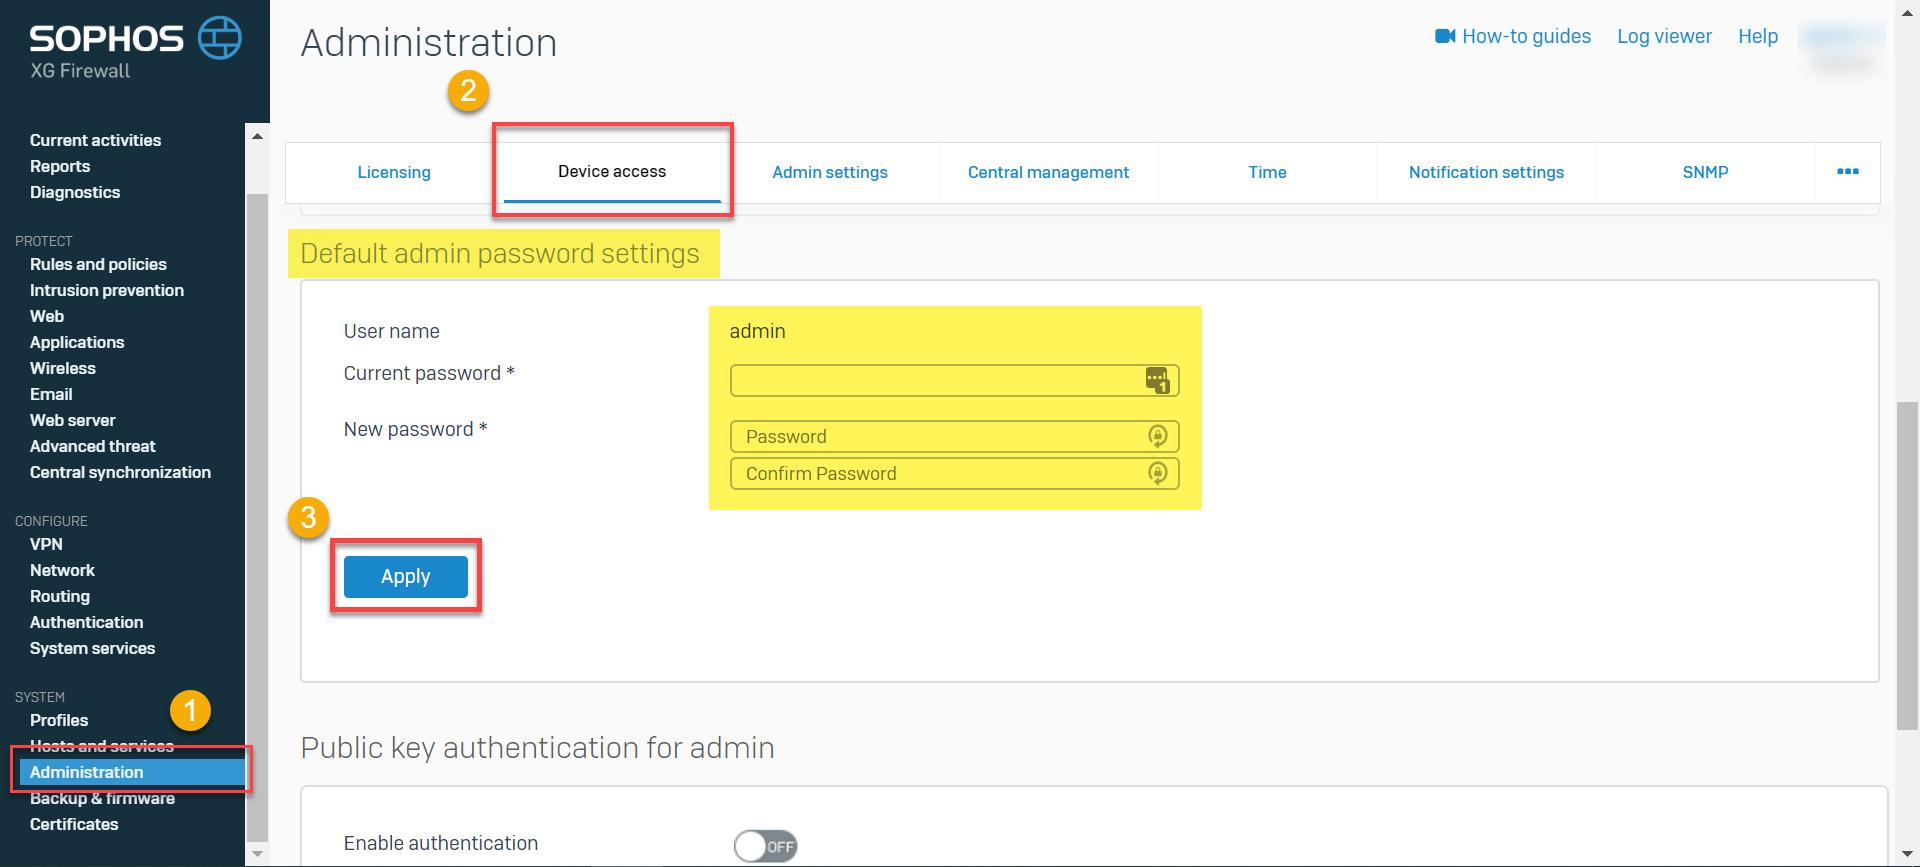 Sophos Firewall: Reset the admin password